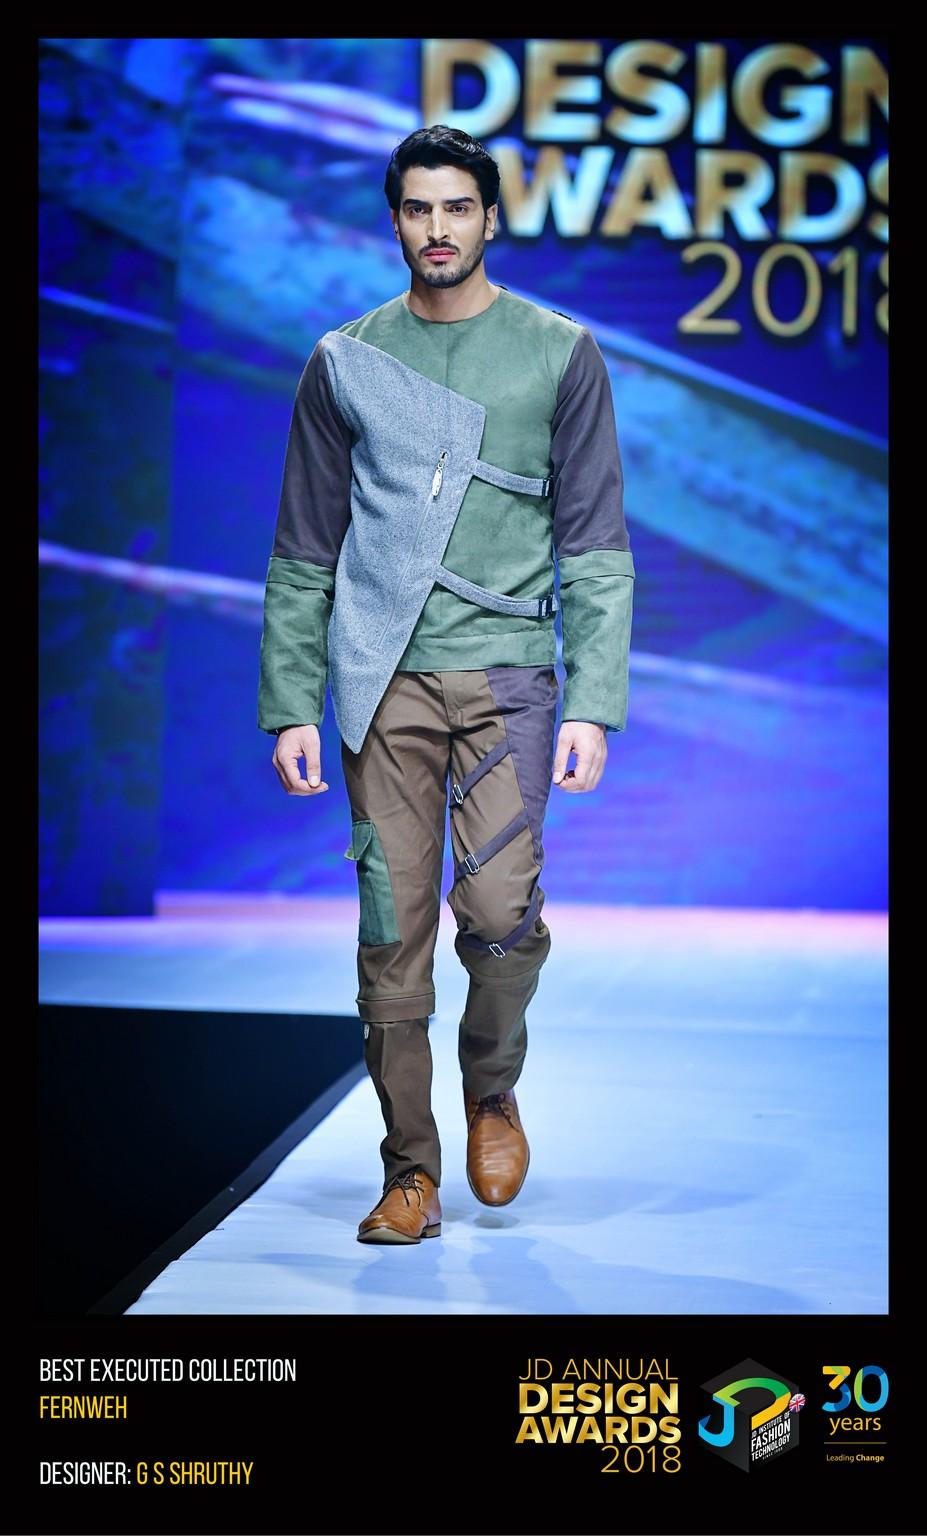 Fernweh – Change – JD Annual Design Awards 2018 | Designer: G.S Shruthi (ADFD 2015 Batch) | Photography : Jerin Nath (@jerin_nath) fernweh Fernweh – Change – JD Annual Design Awards 2018 FERNWEH